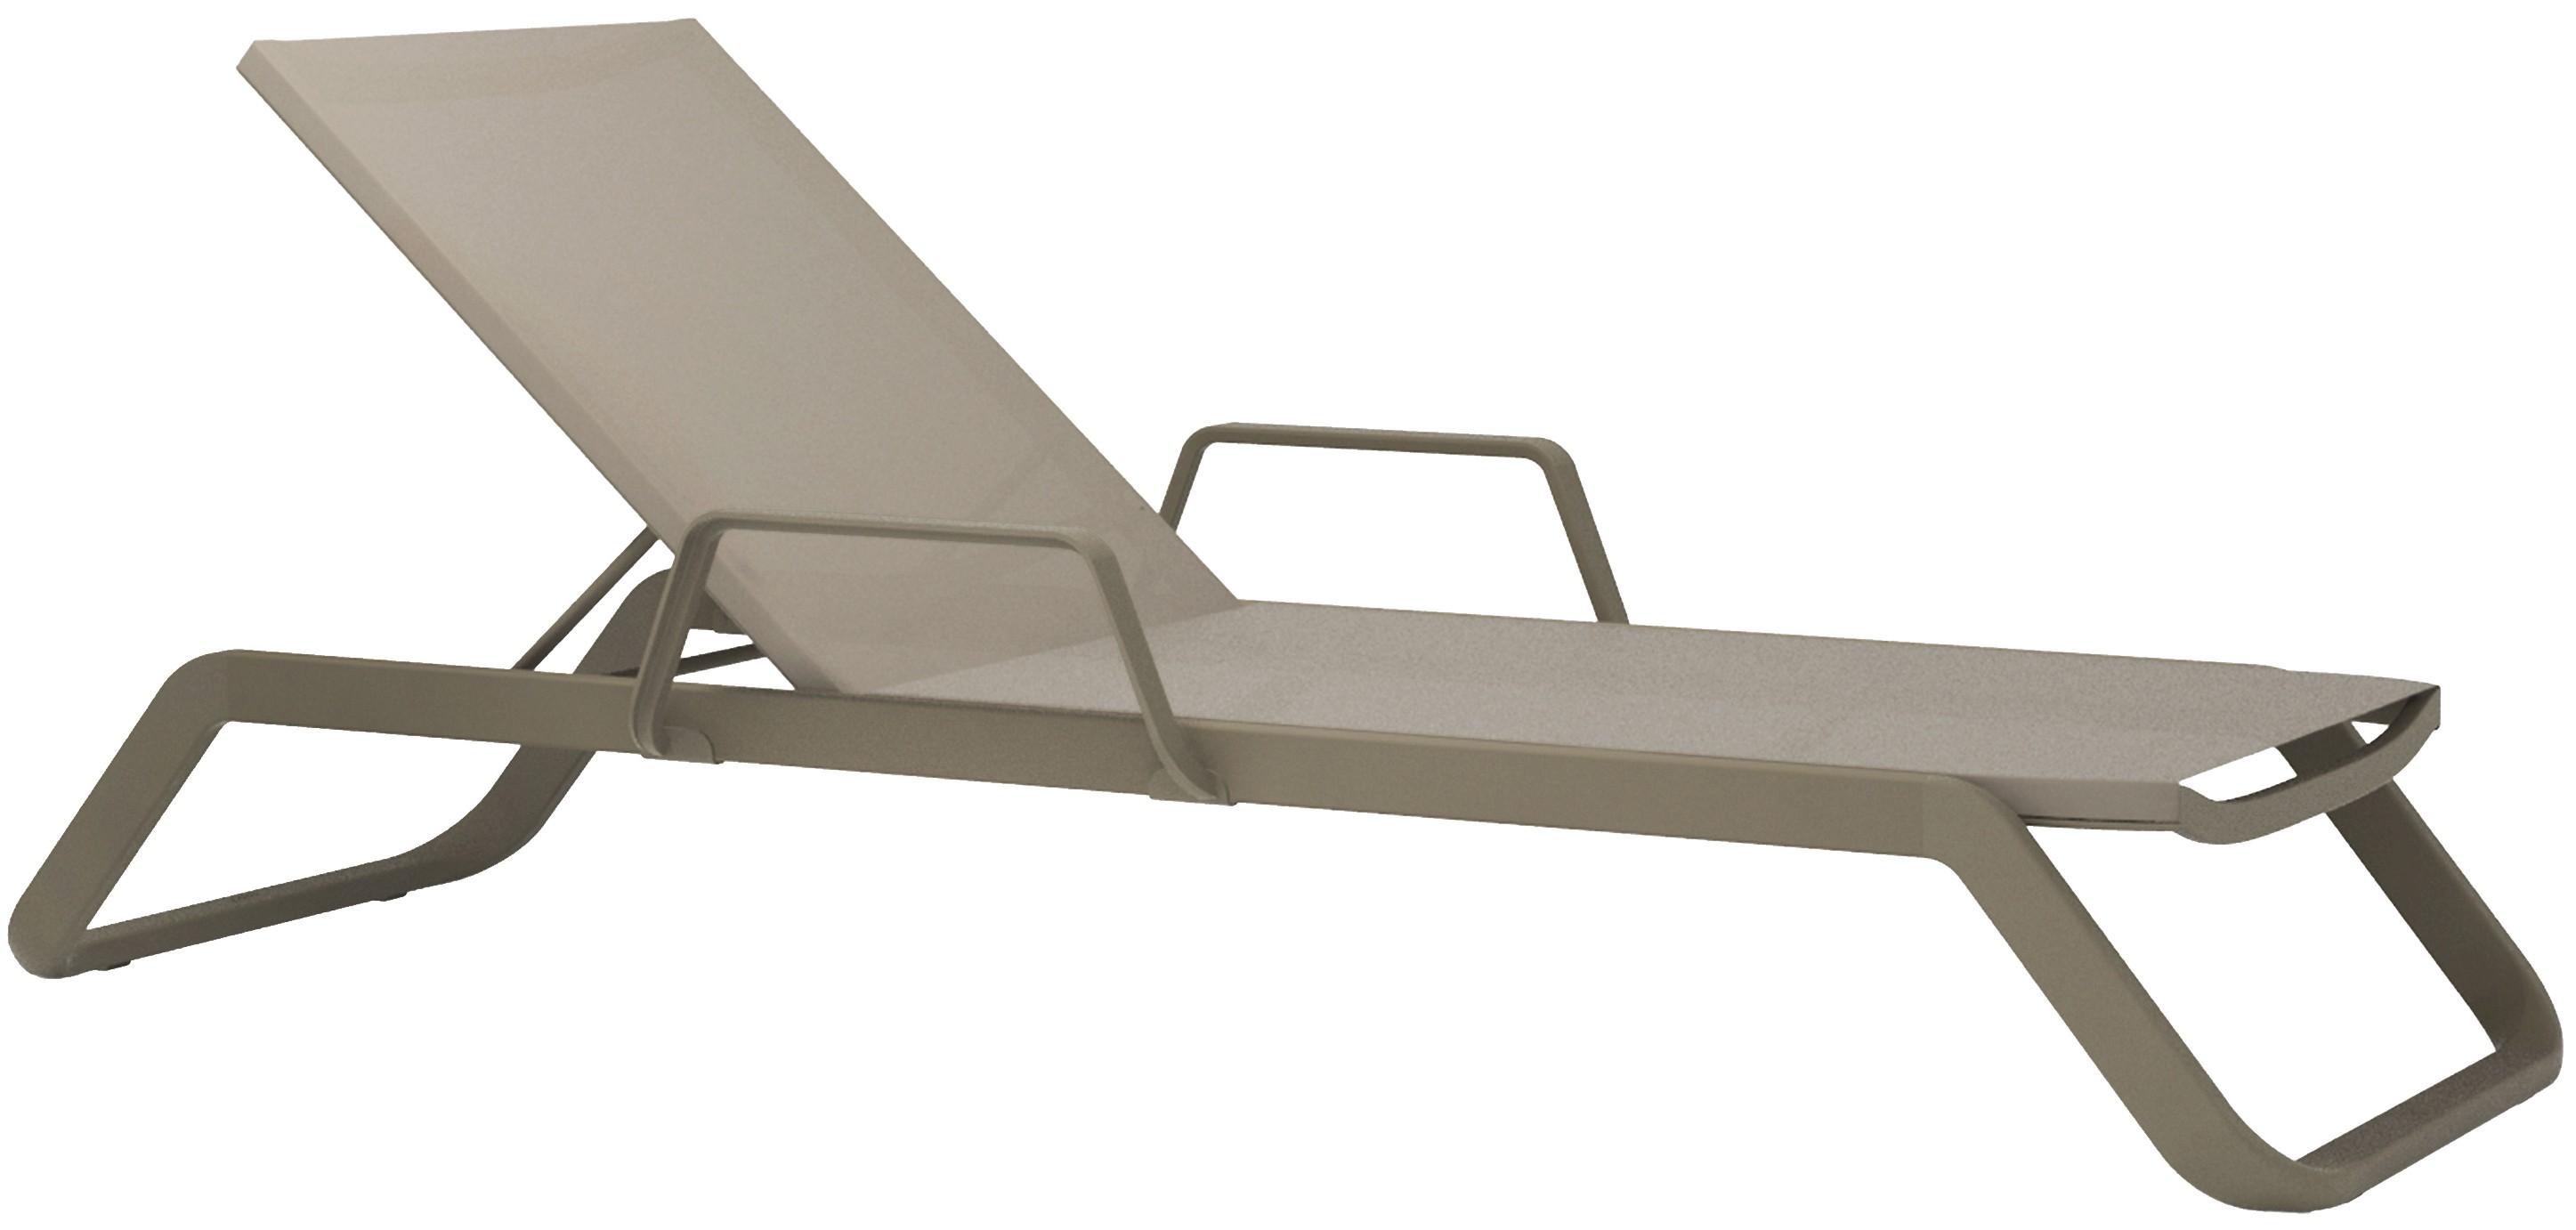 Lounge Ezpeleta Tumbona con brazos taupe  Marrones Aluminio lacado Textiline